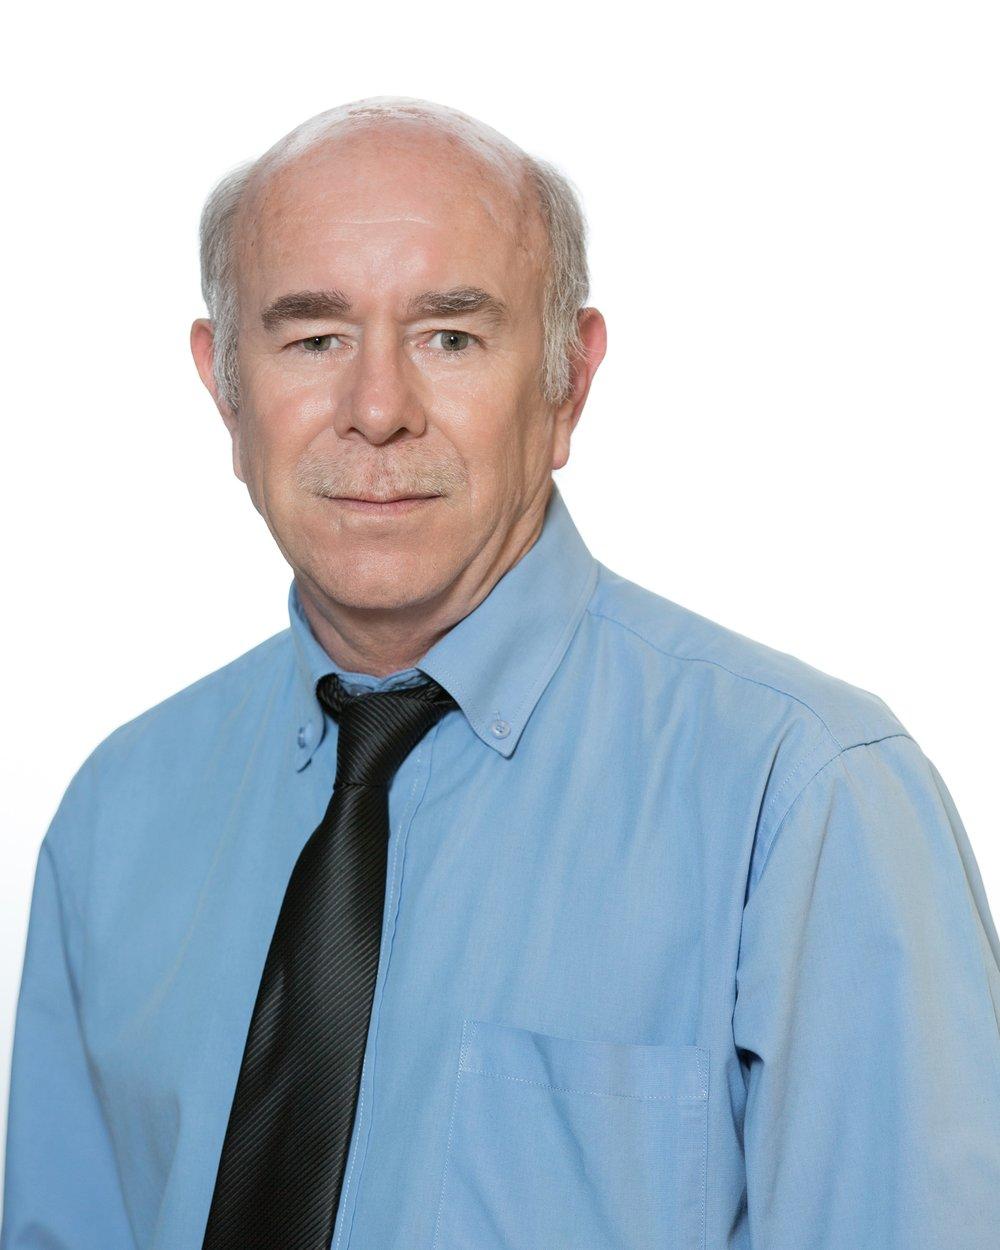 JOHN MCRORY - CAD TECHNICIAN